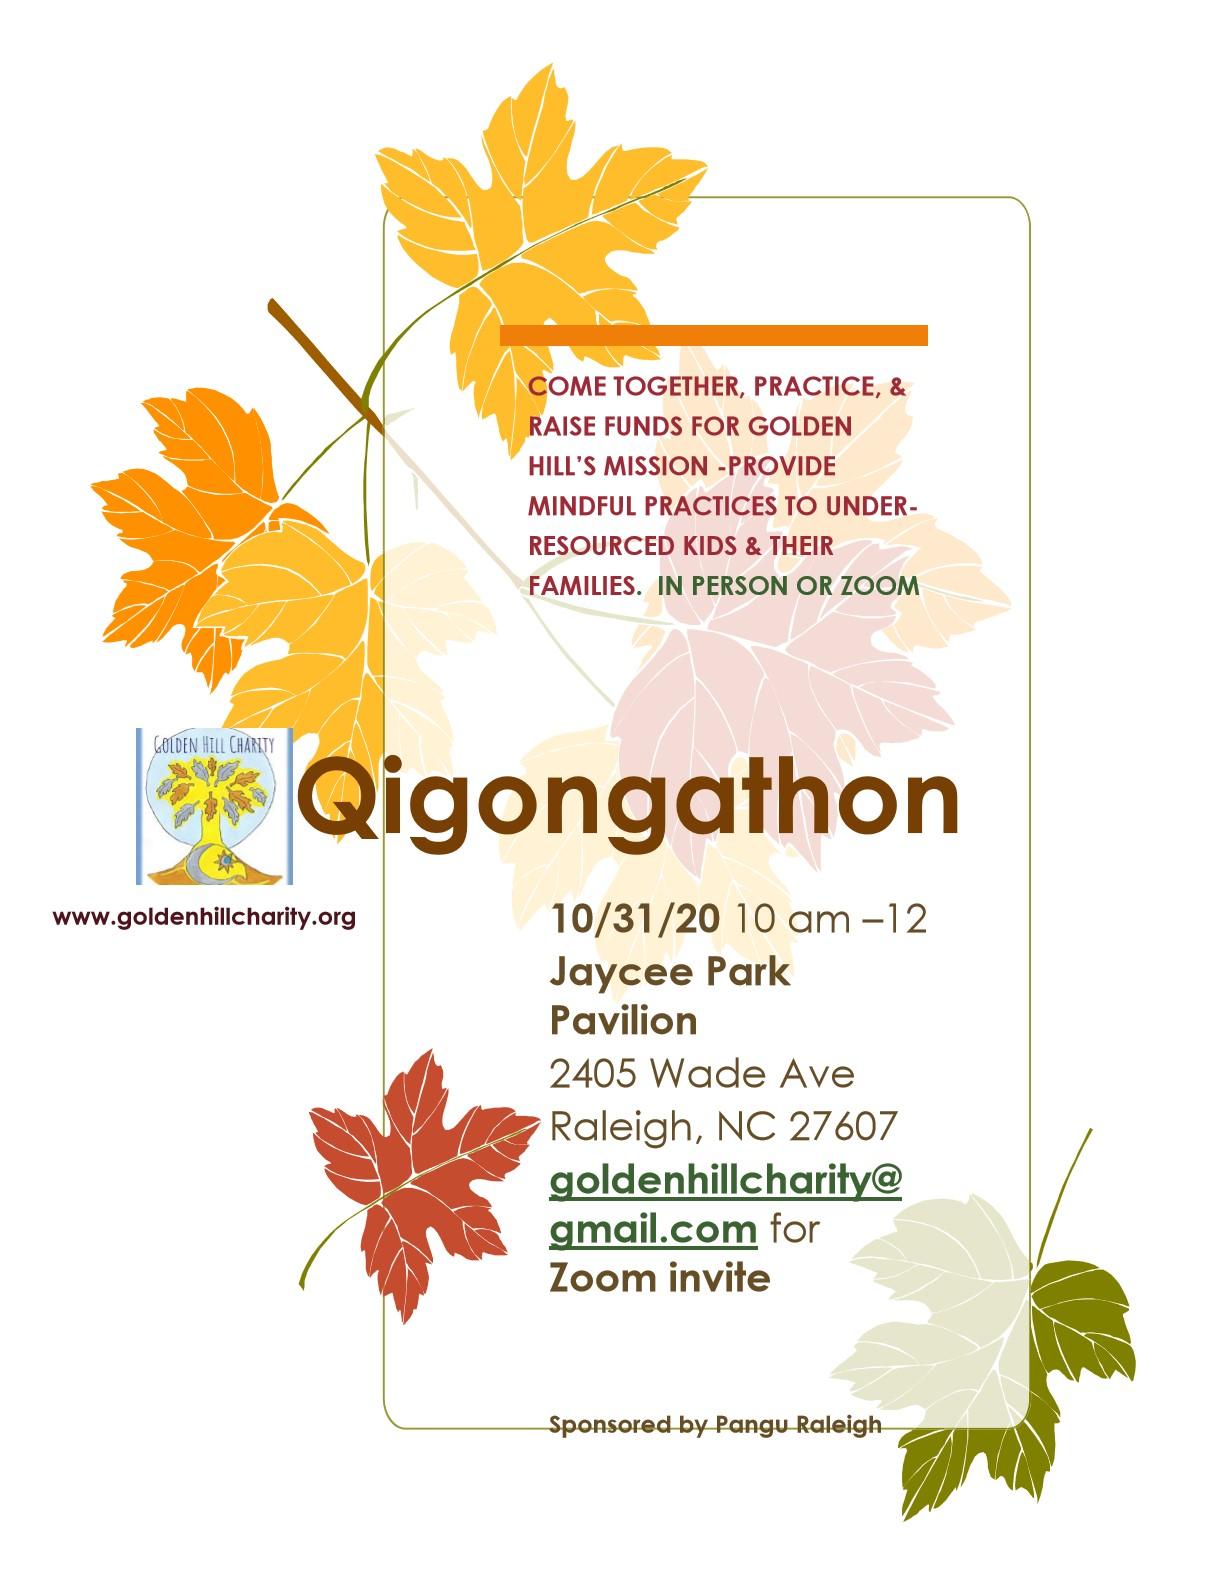 Qigongathon flyer 2020_1